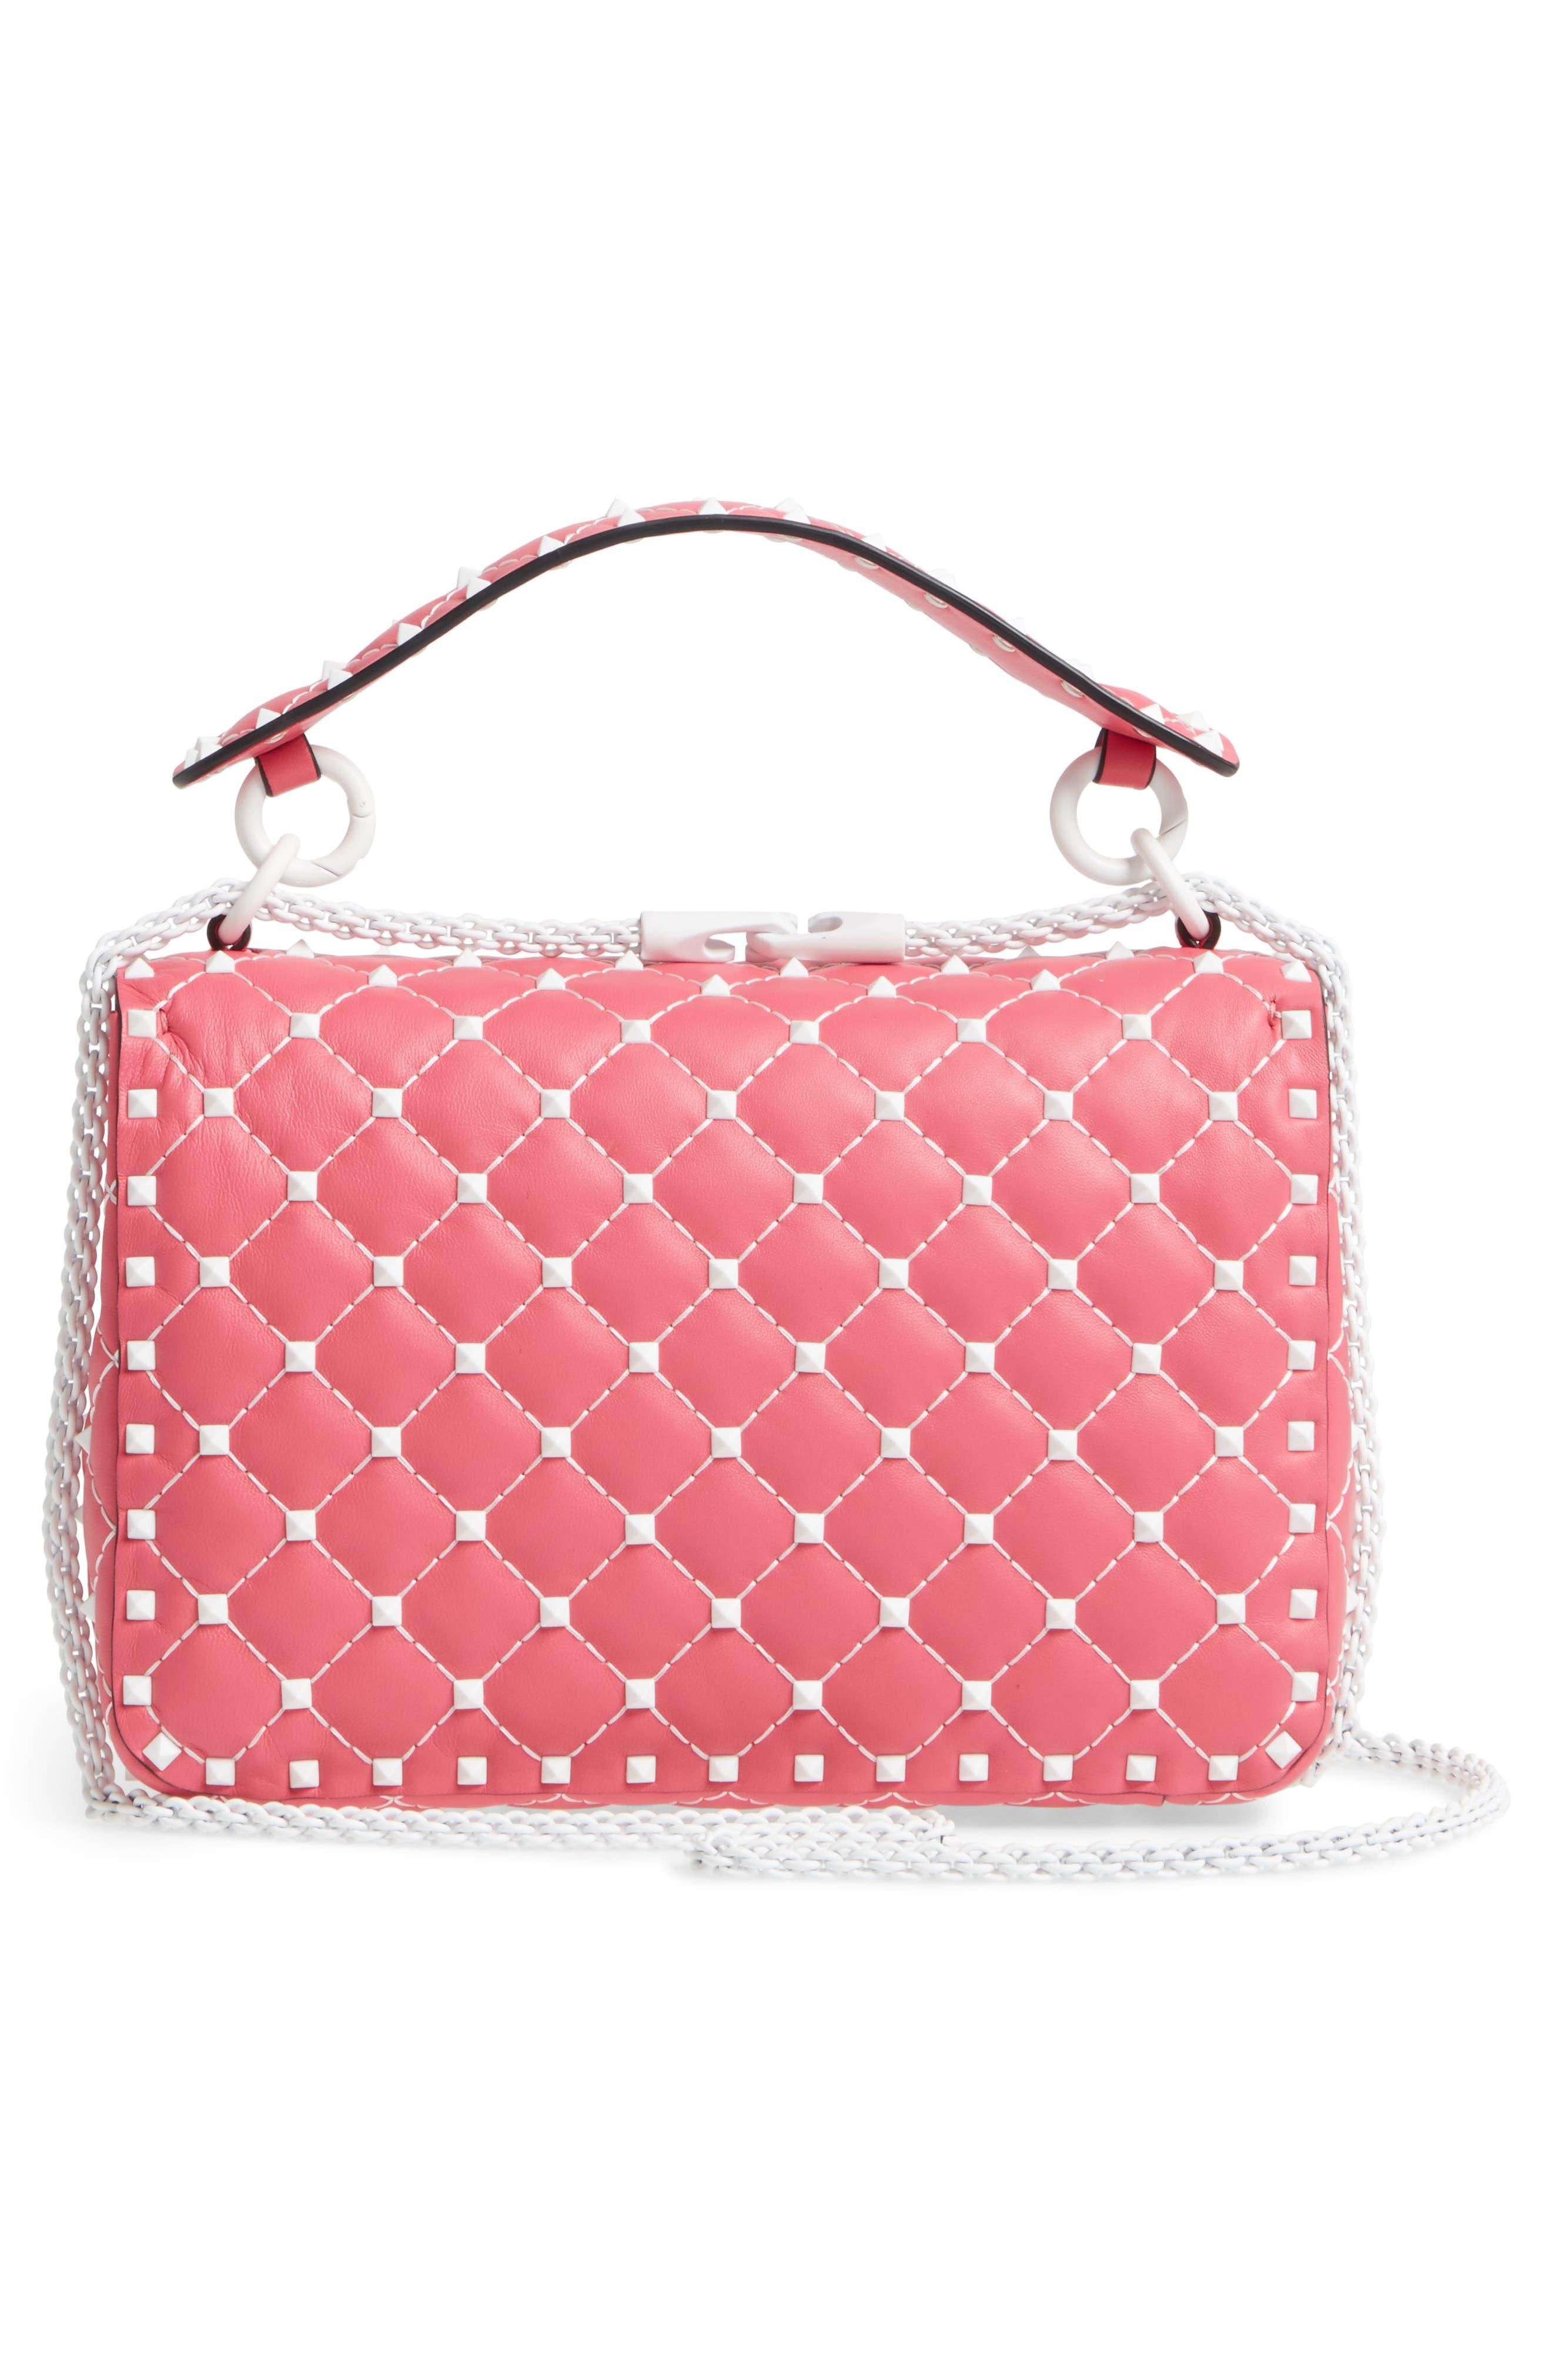 Medium Rockstud Matelassé Leather Shoulder Bag,                             Alternate thumbnail 9, color,